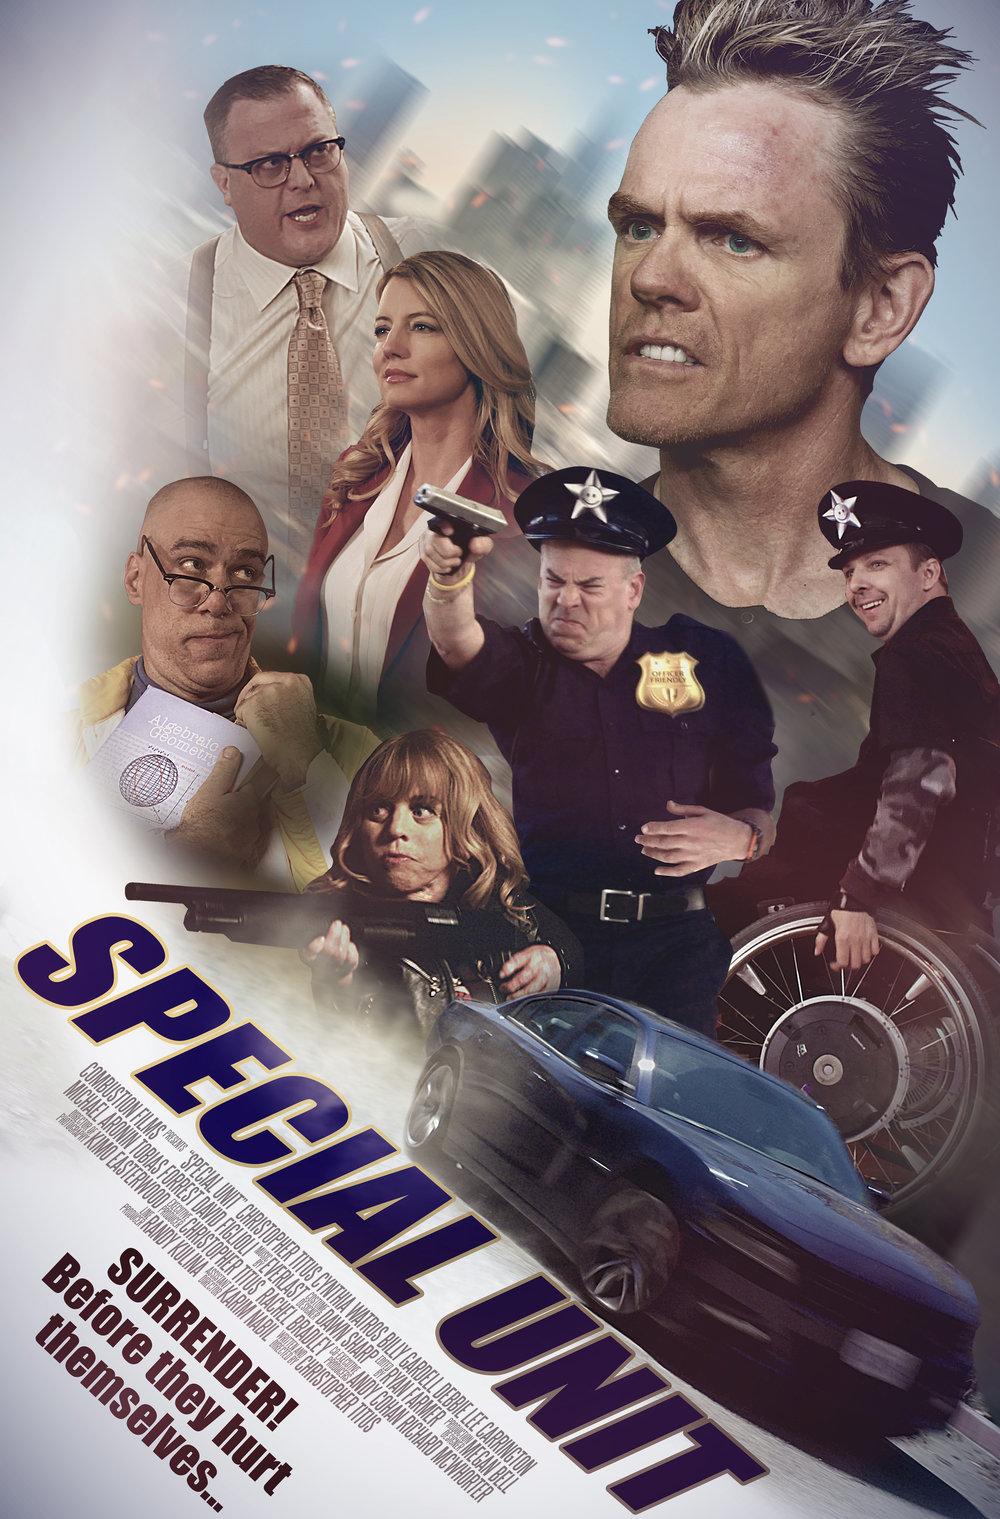 SU_Poster.jpg